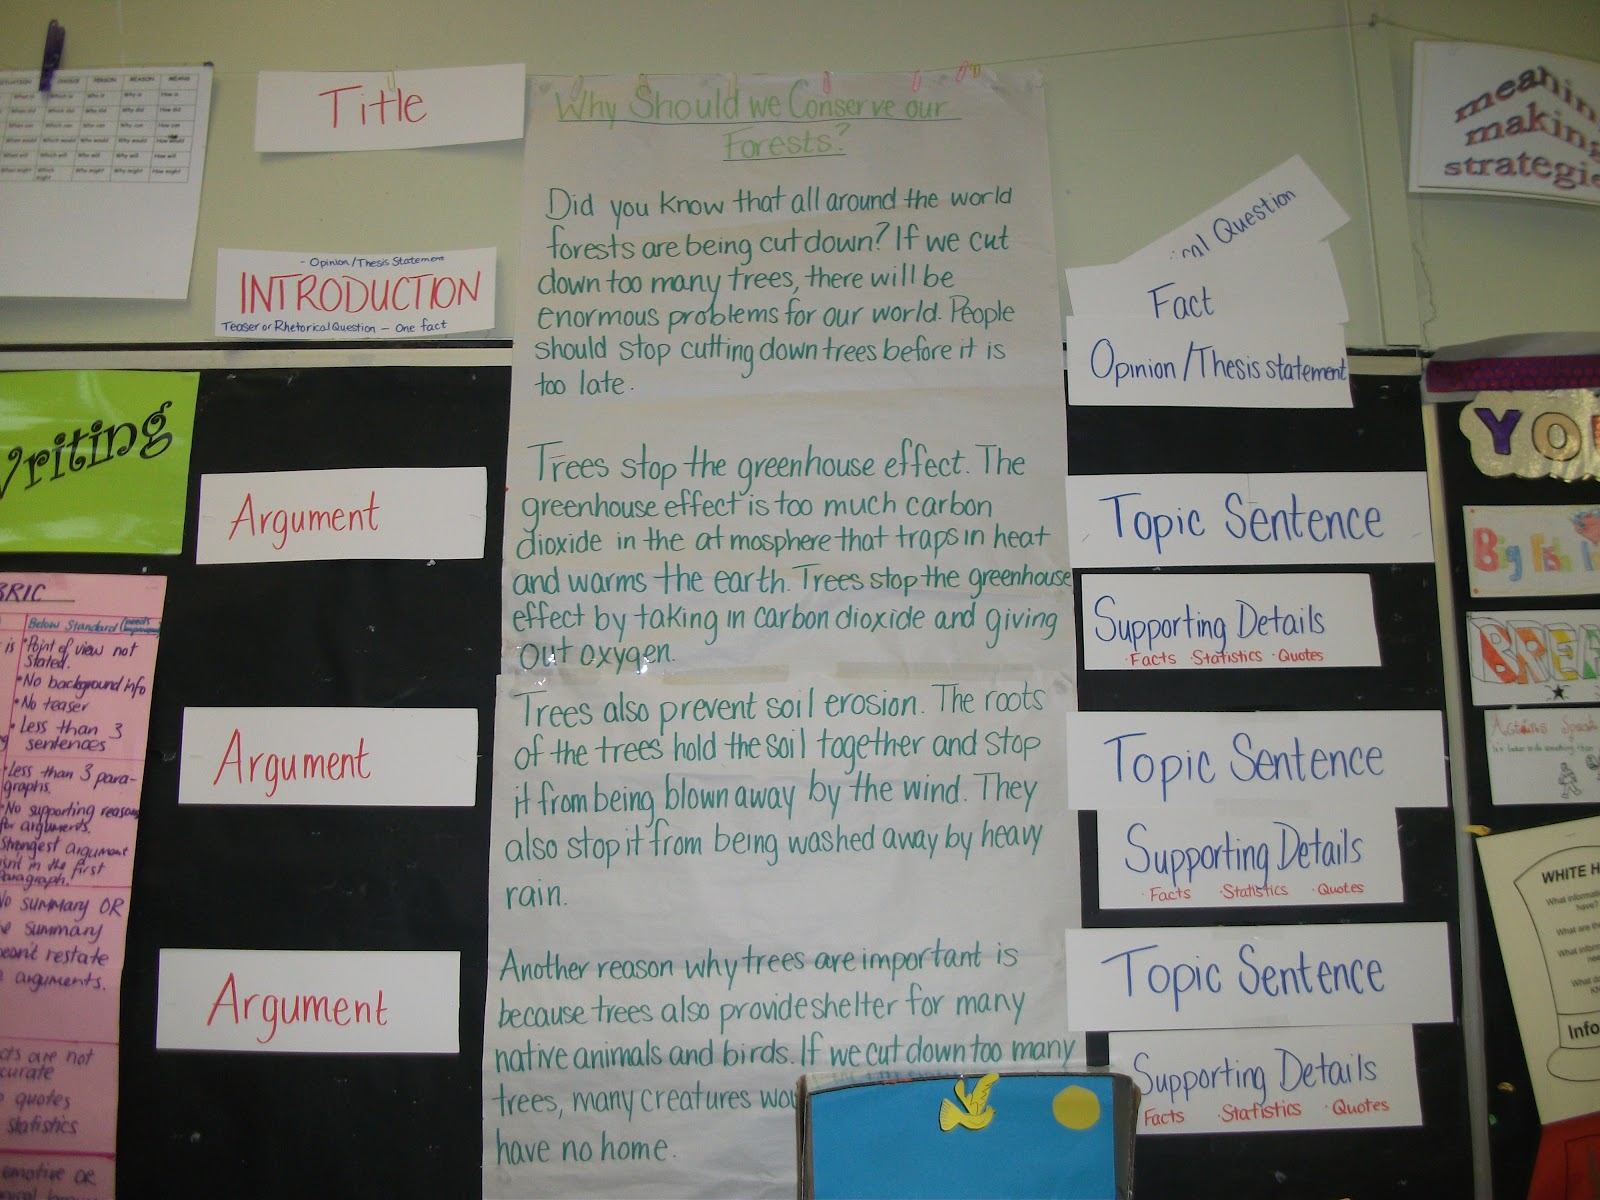 The wall argumentative essay